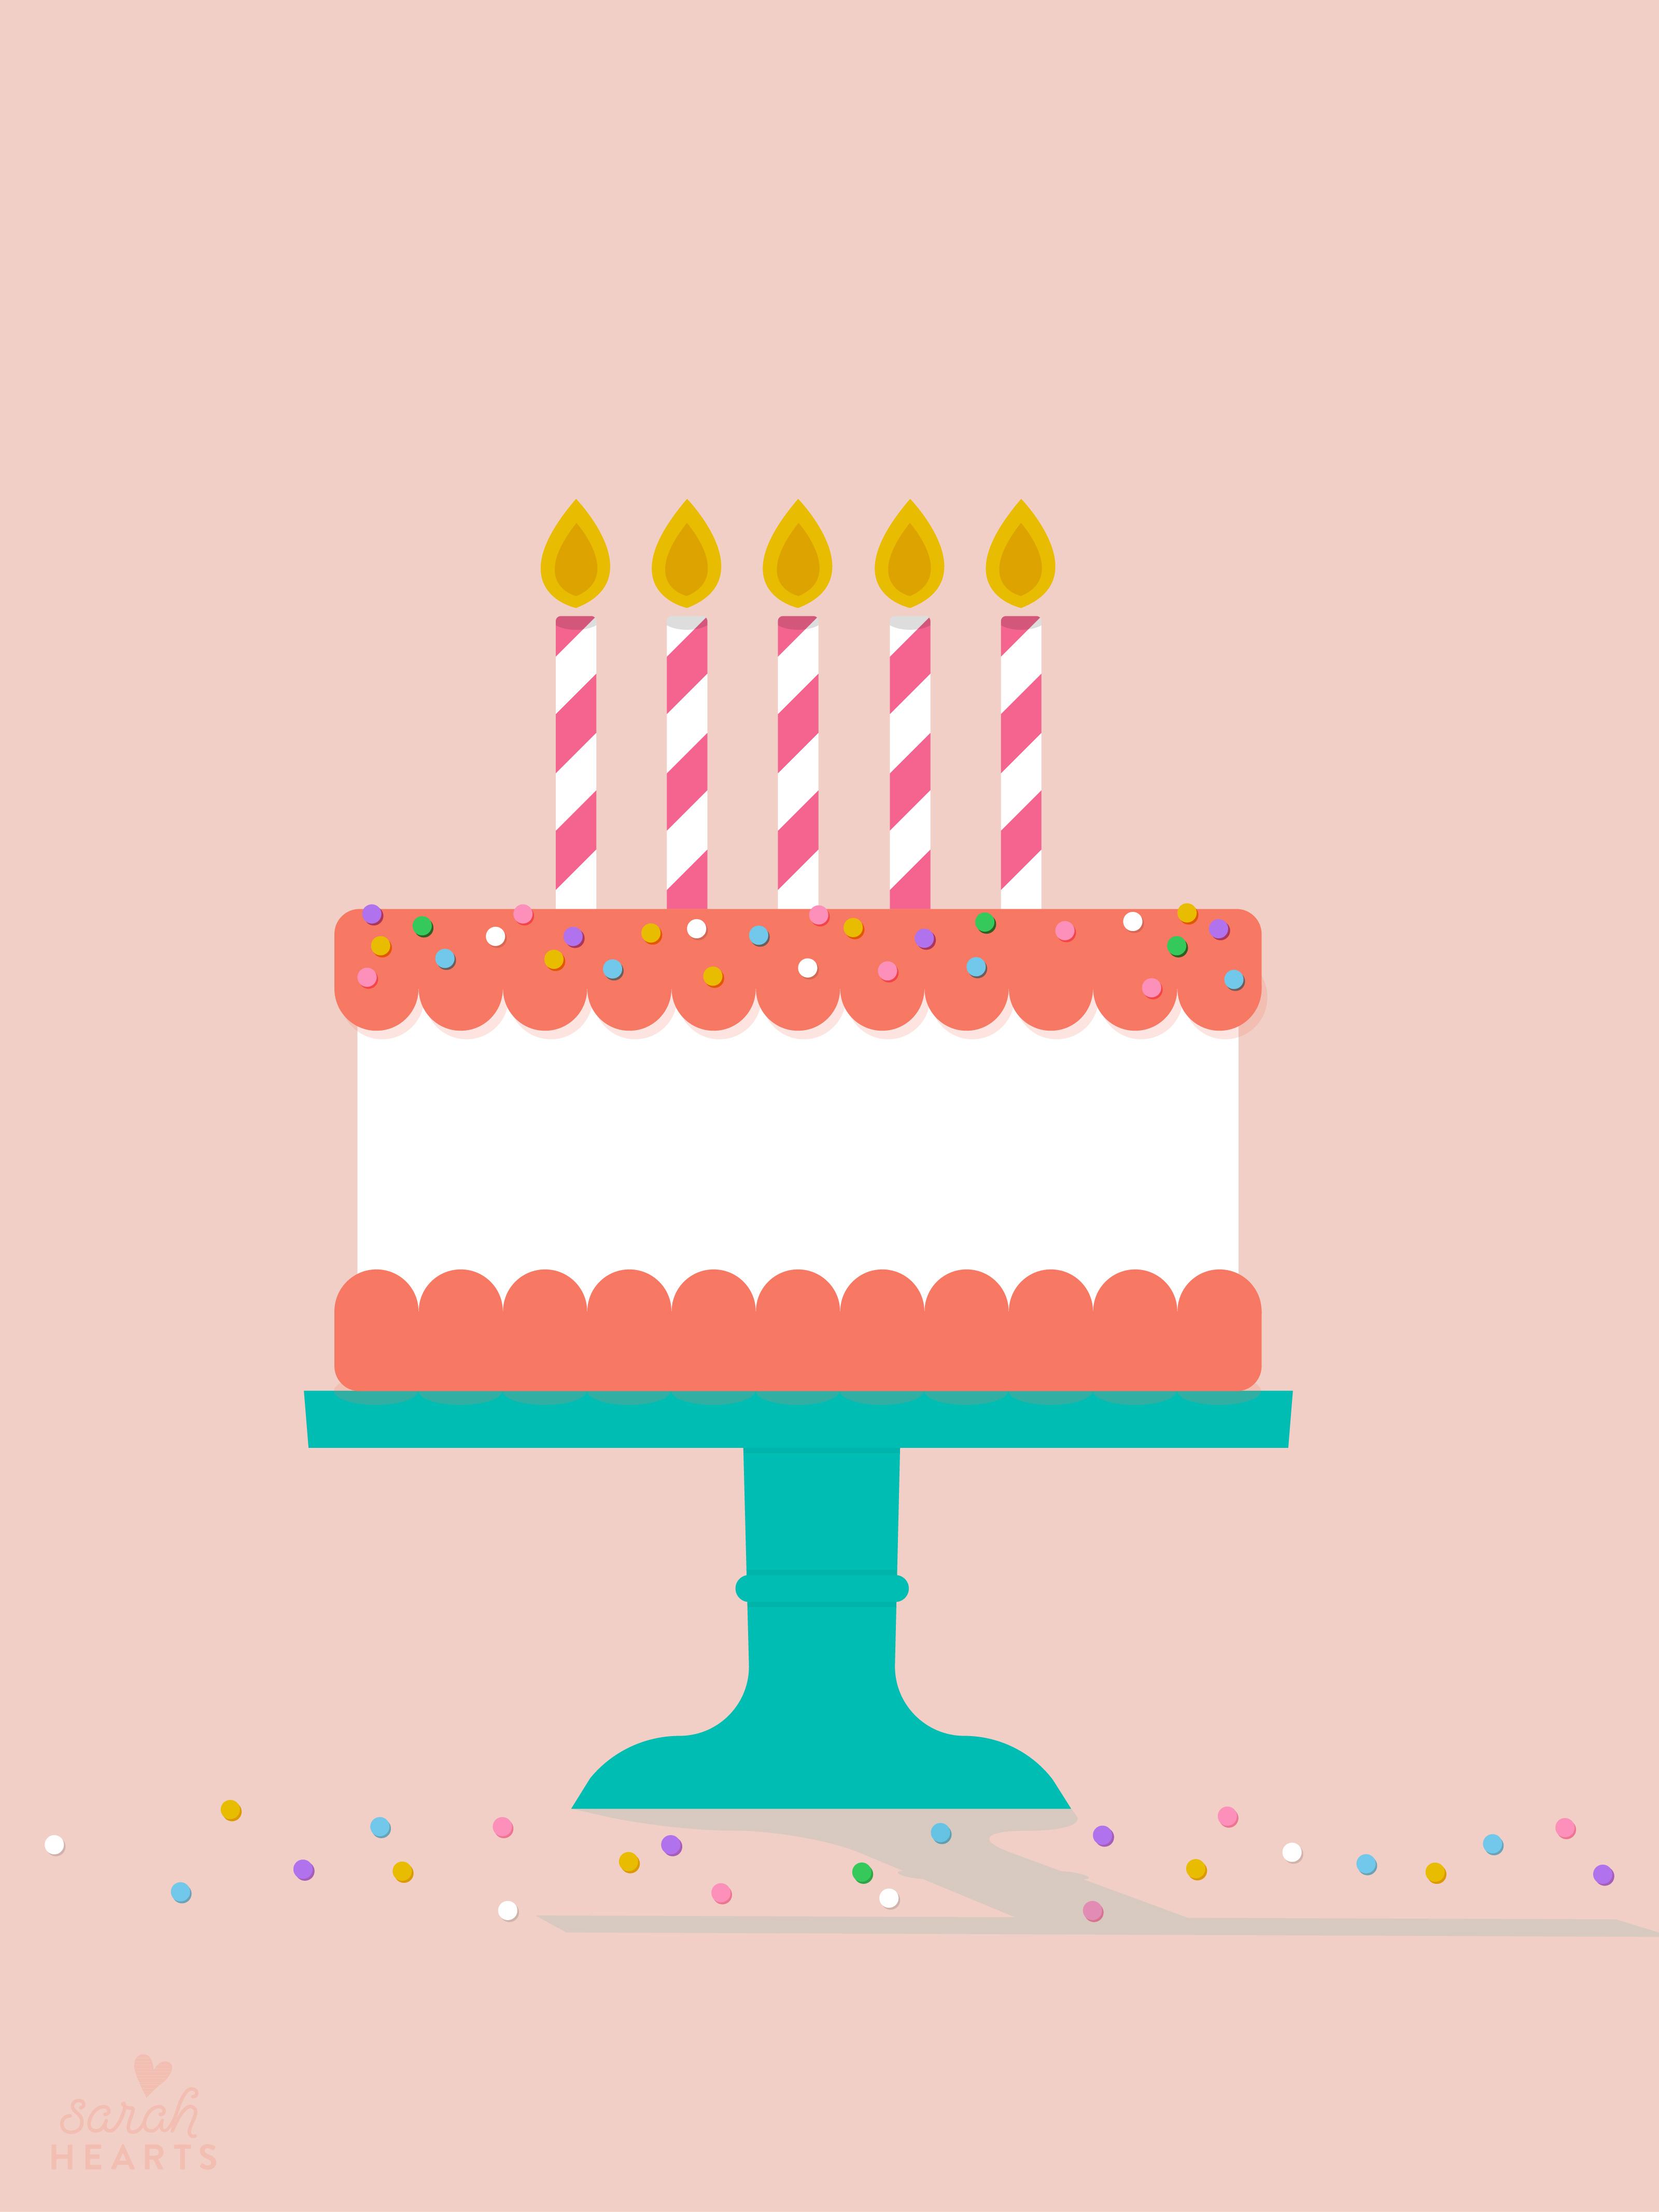 July 2016 Birthday Cake Calendar Wallpaper Sarah Hearts